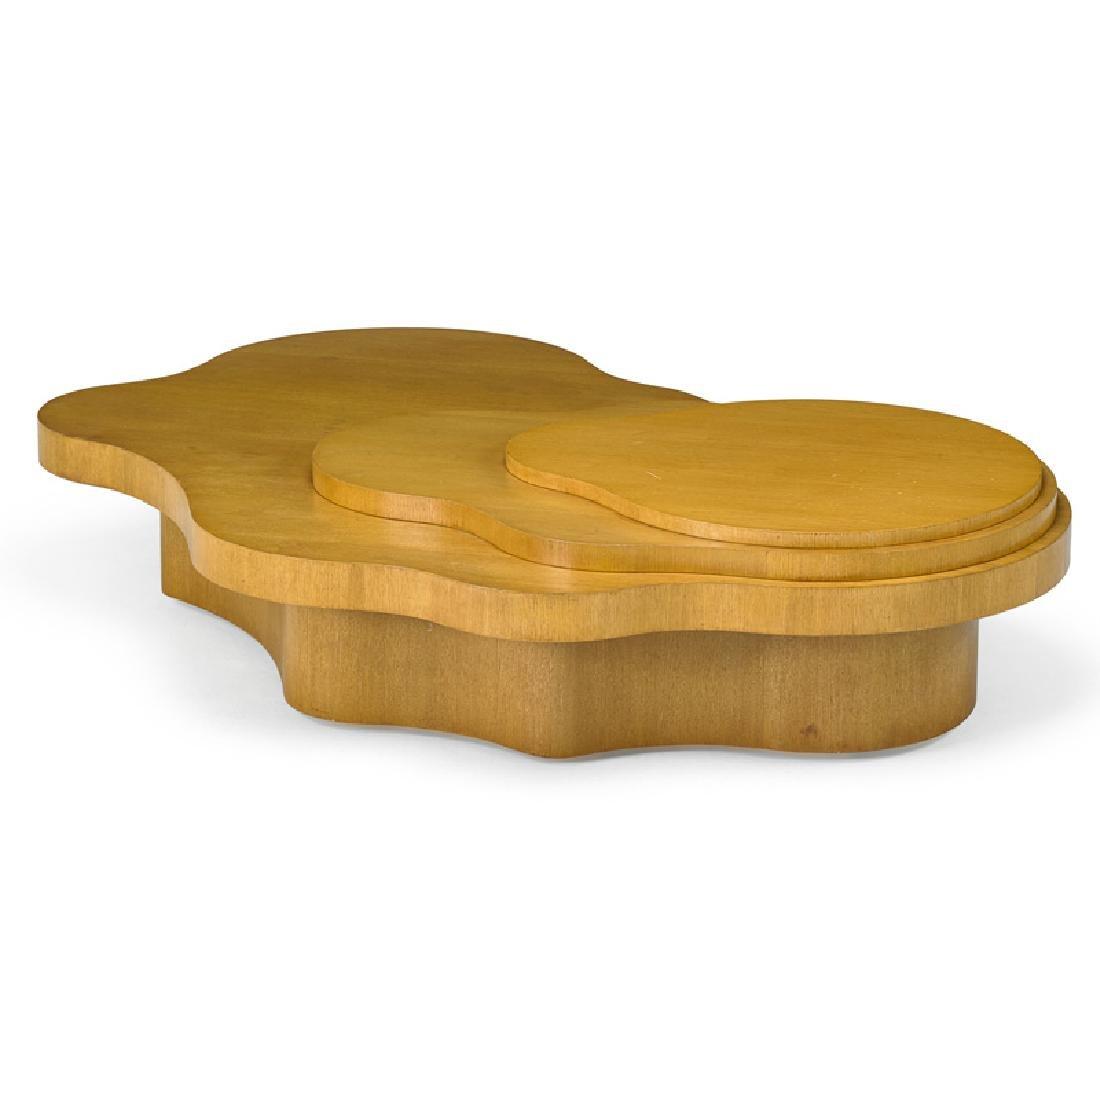 T.H. ROBSJOHN-GIBBINGS Large Mesa coffee table